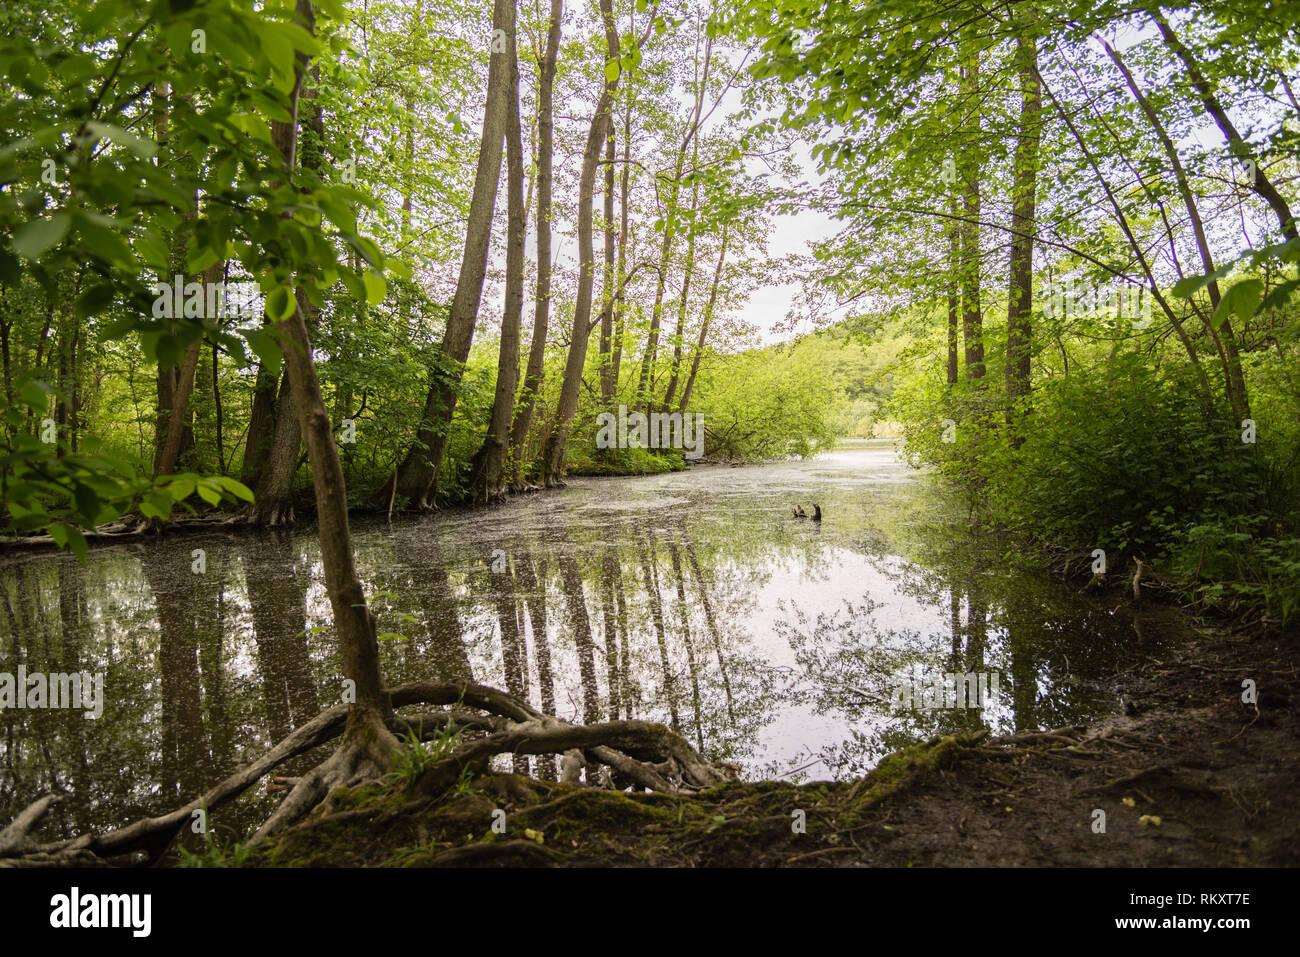 Creek connecting the Schwentine River with the Grosser Plöner See or Big Plön Lake, Plön, Schleswig-Holstein, Germany - Stock Image